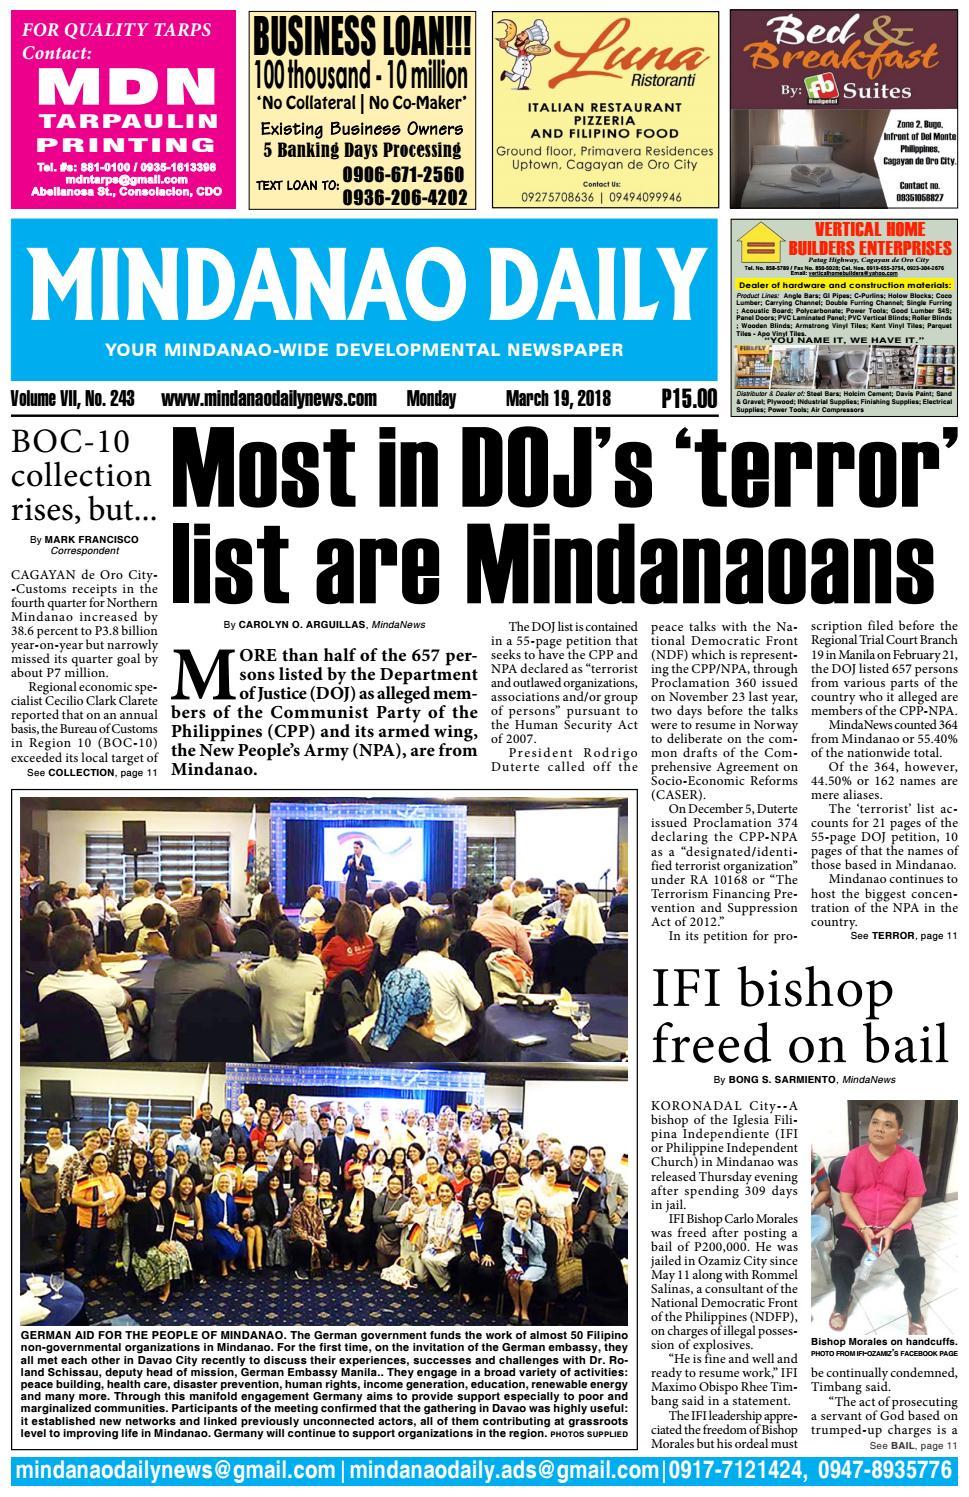 Mindanao Daily March 19 2018 By Mindanao Daily News Issuu